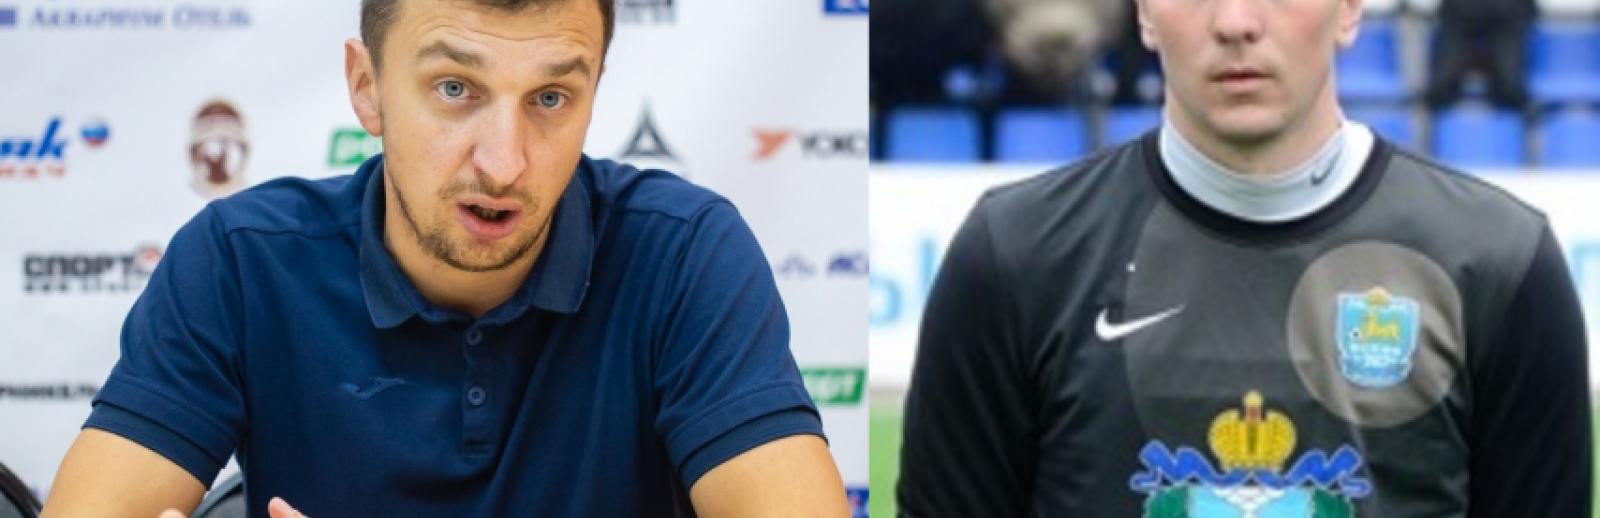 Максим Берегов и Денис Трункин возглавили команду «Электрон» U-8